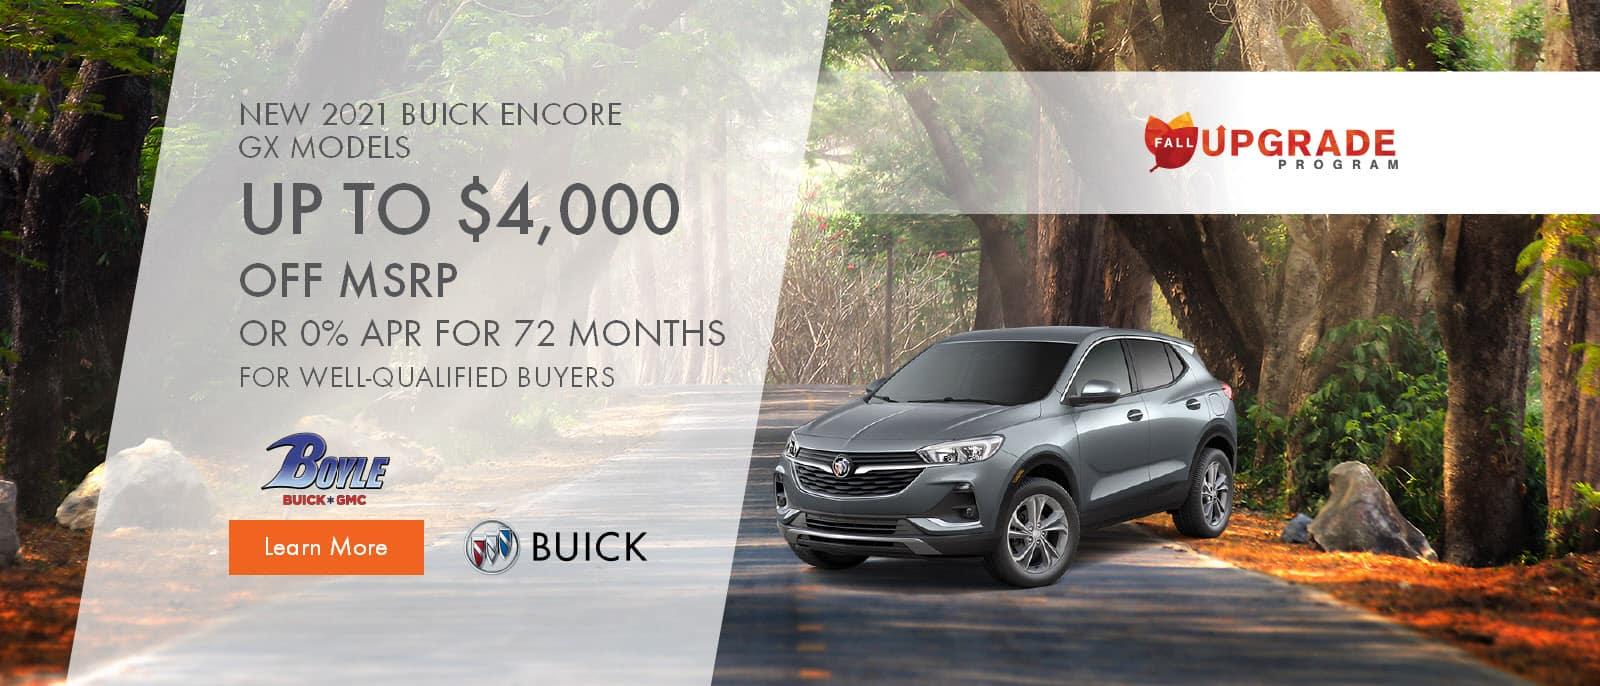 2021 Buick Encore GX Models